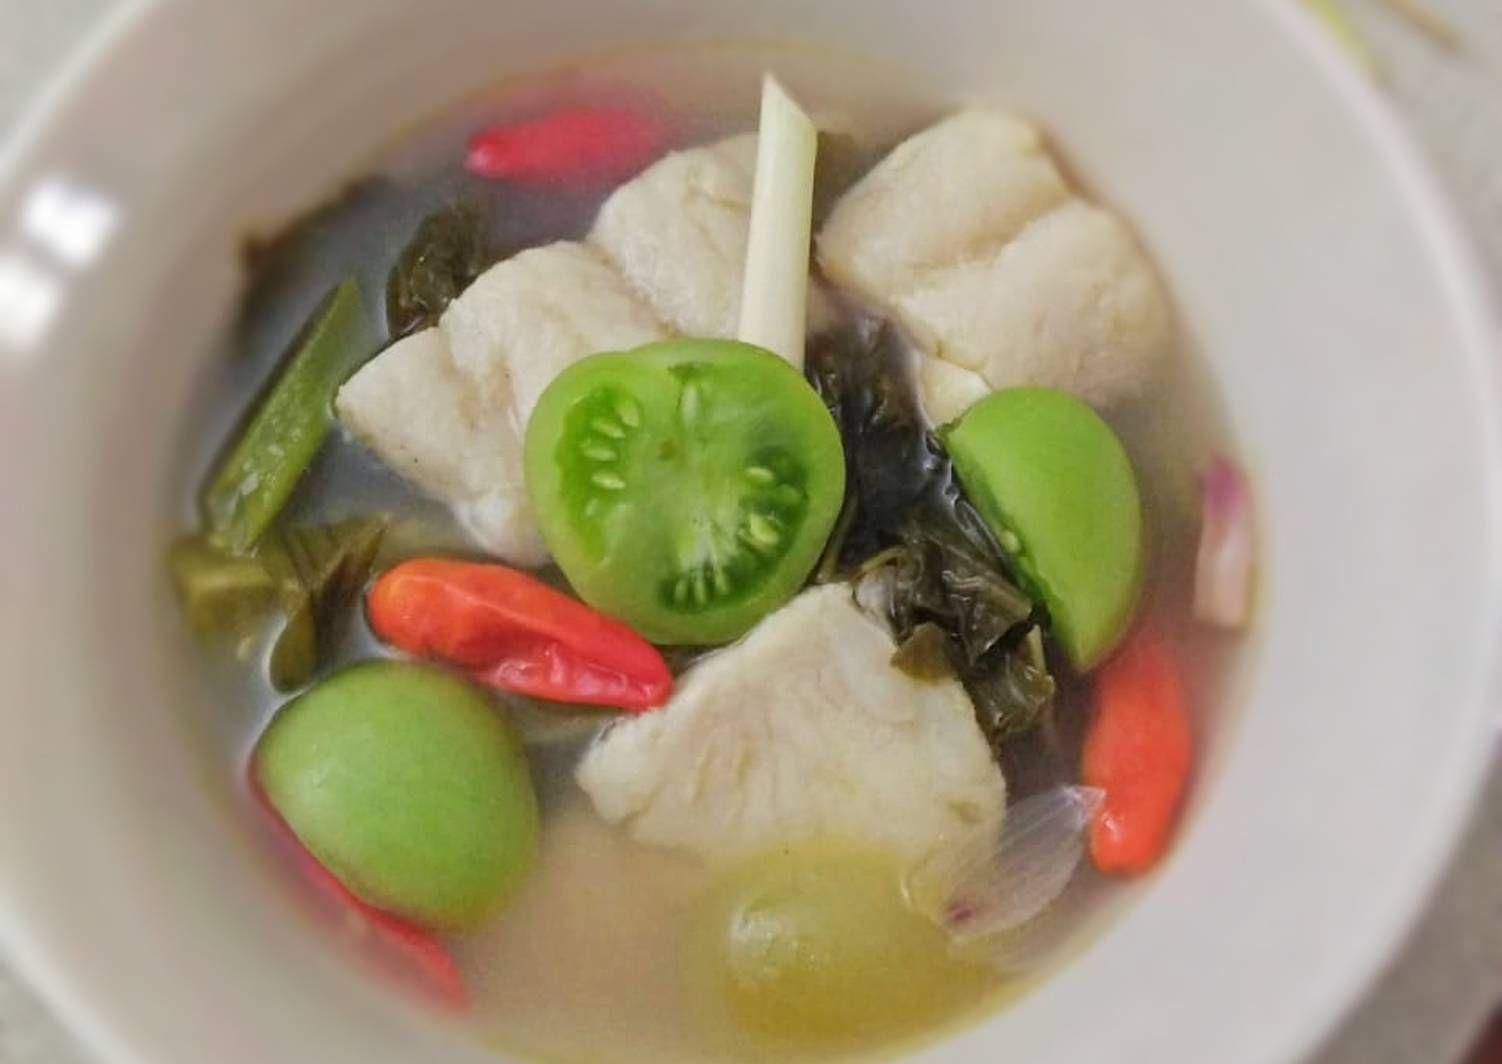 Resep Sop Ikan Dory Cemplang Cemplung Oleh Pitraratri Resep Sup Ikan Sup Resep Sup